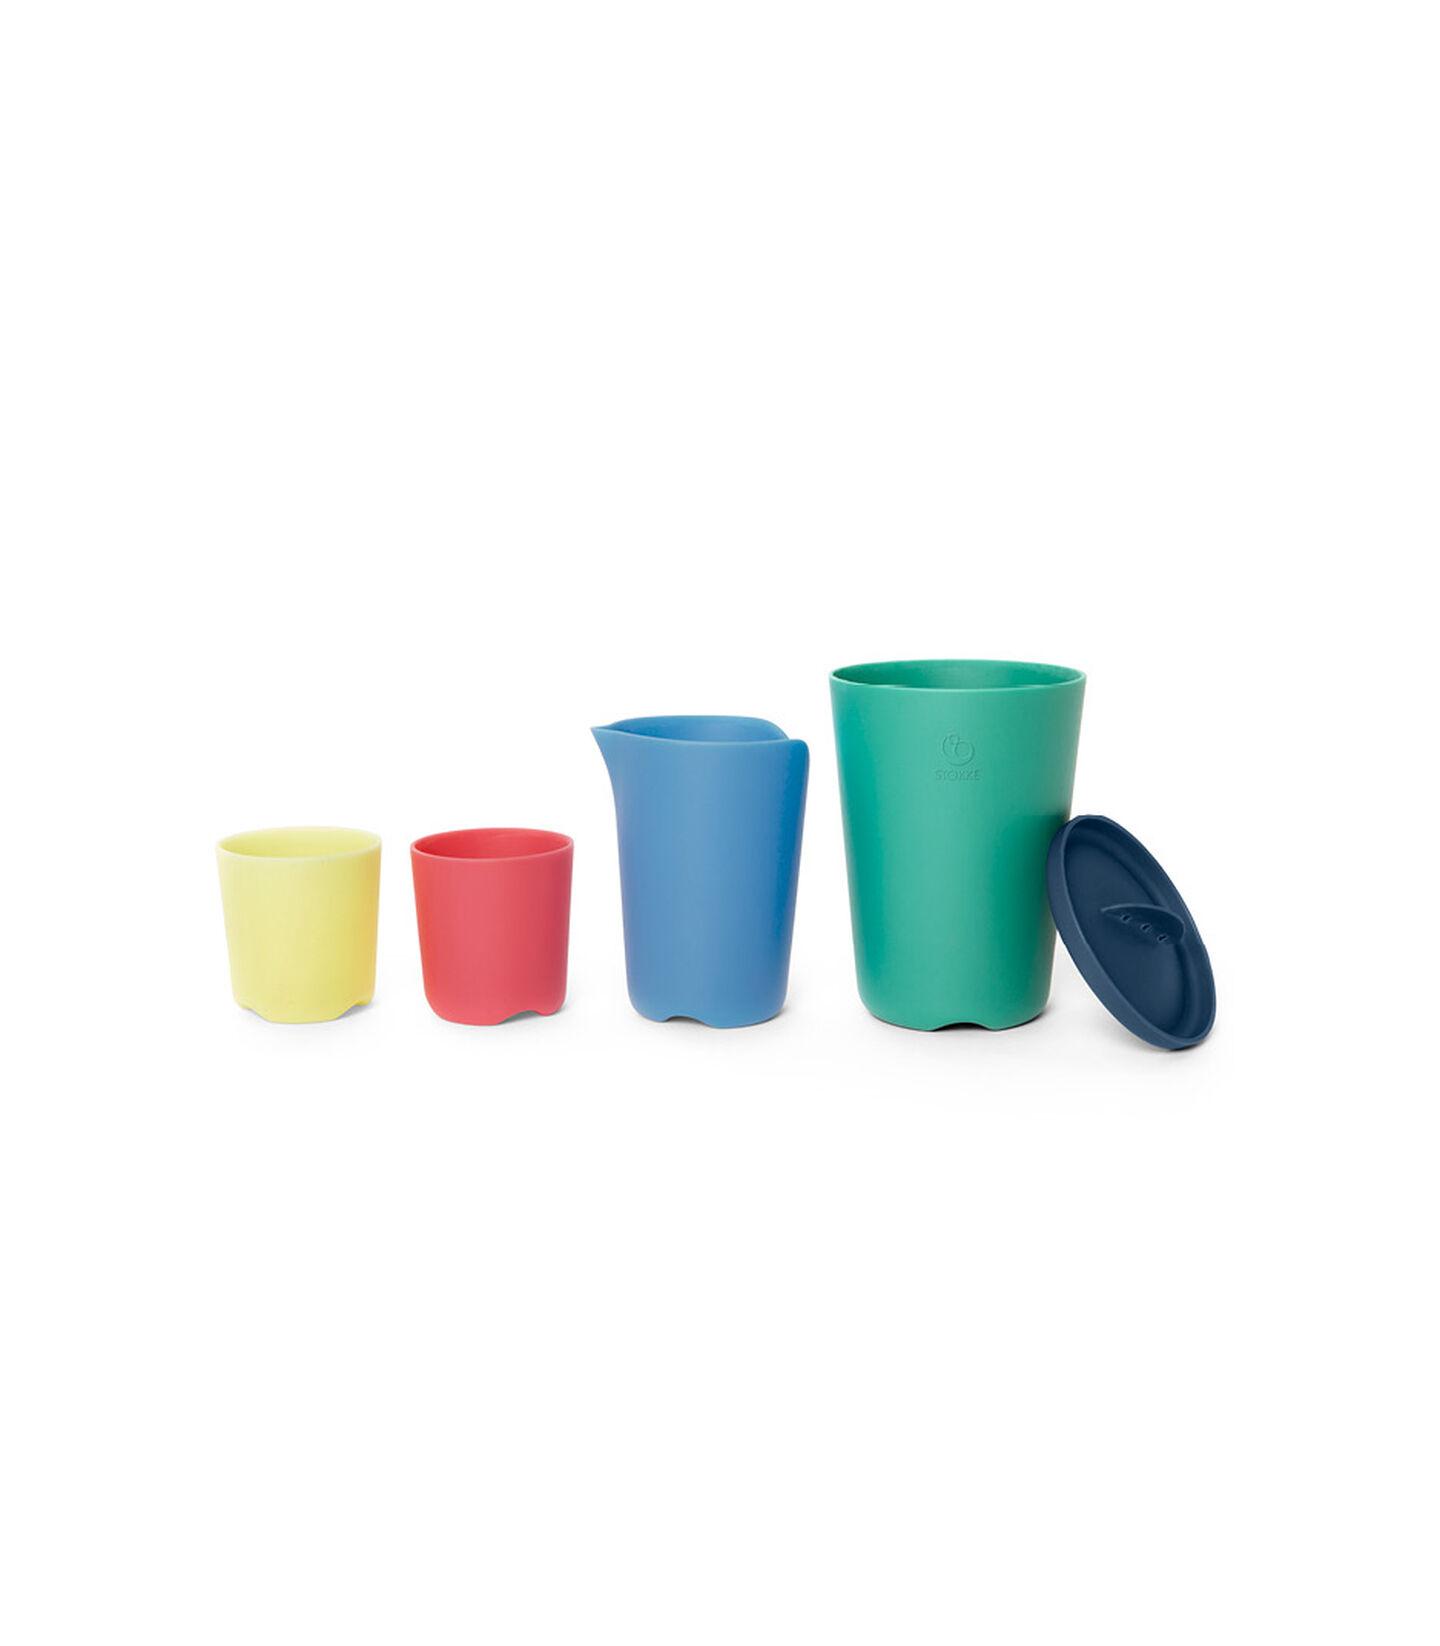 Stokke® Flexibath® Toy Cups Multi Colour, Multicolor, mainview view 1